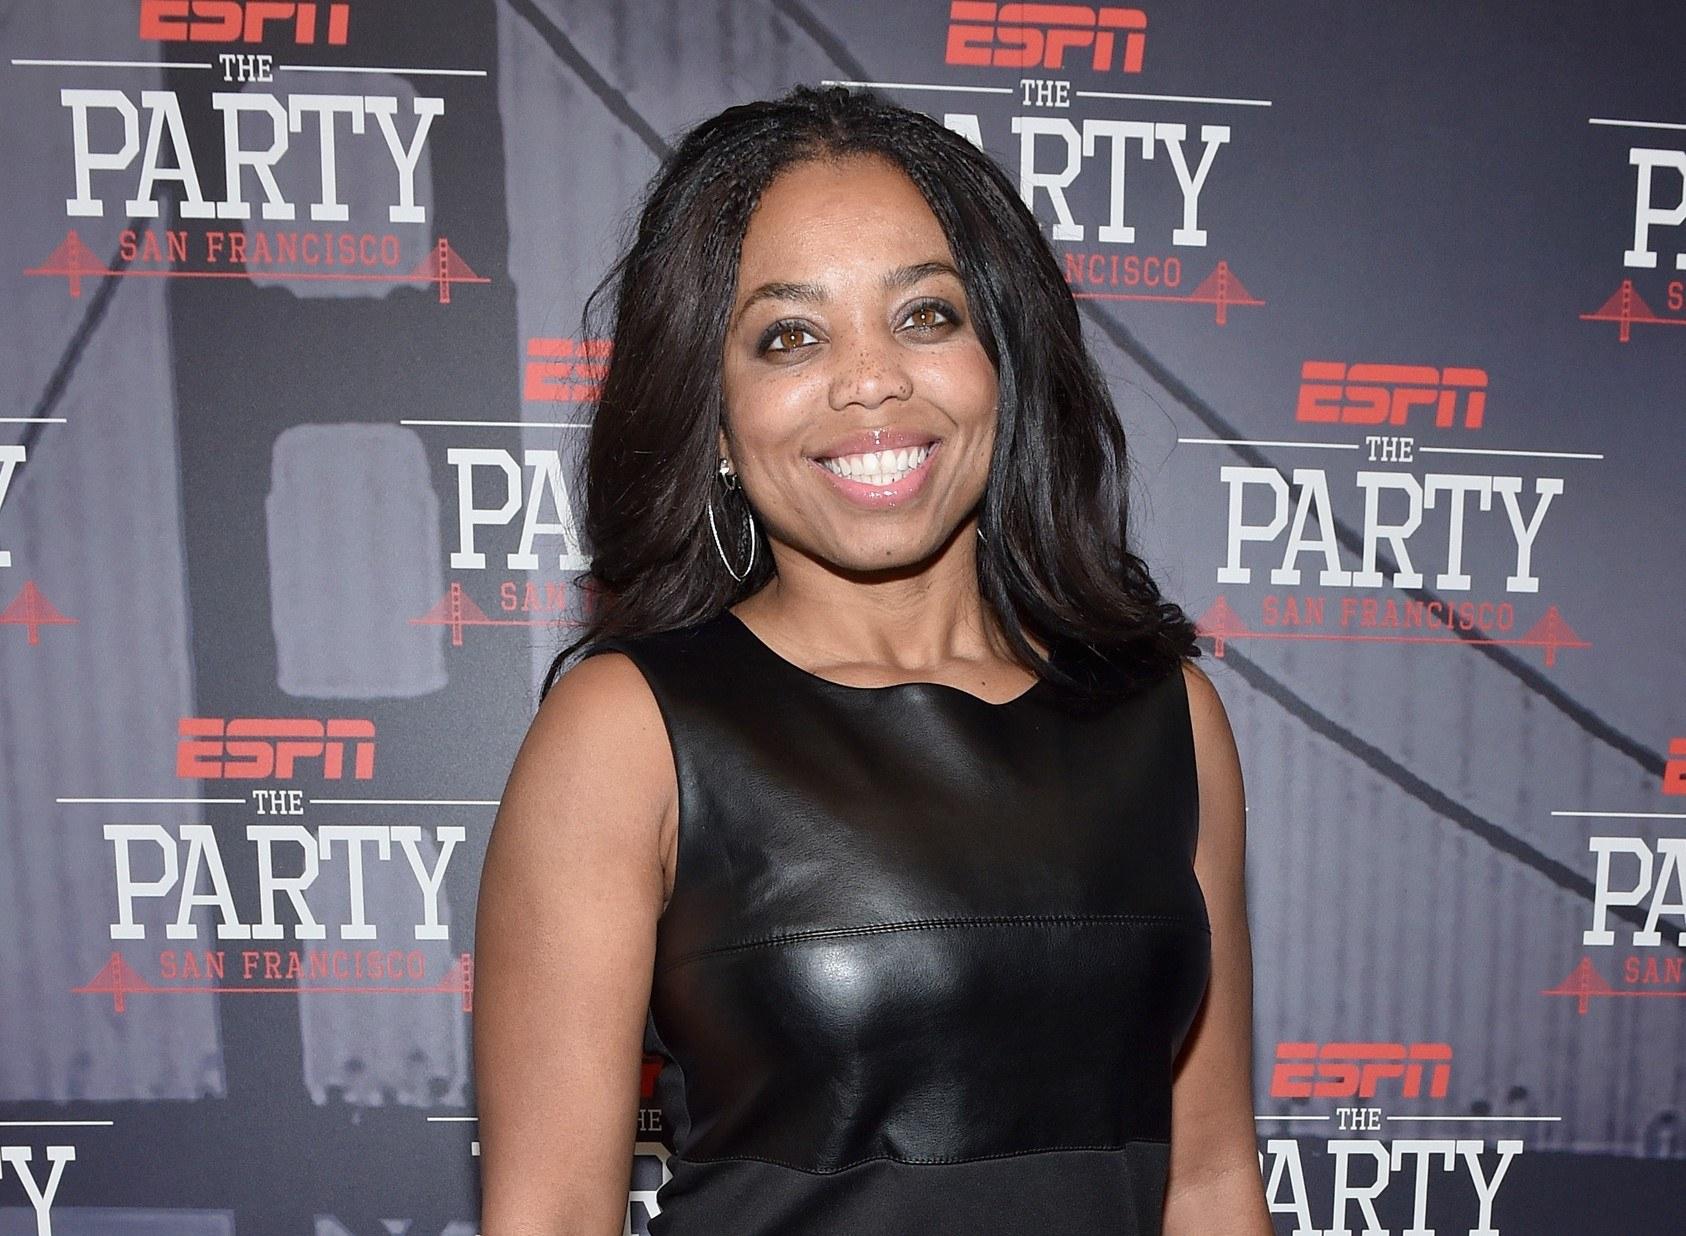 ESPN Journalist Jemele Hill